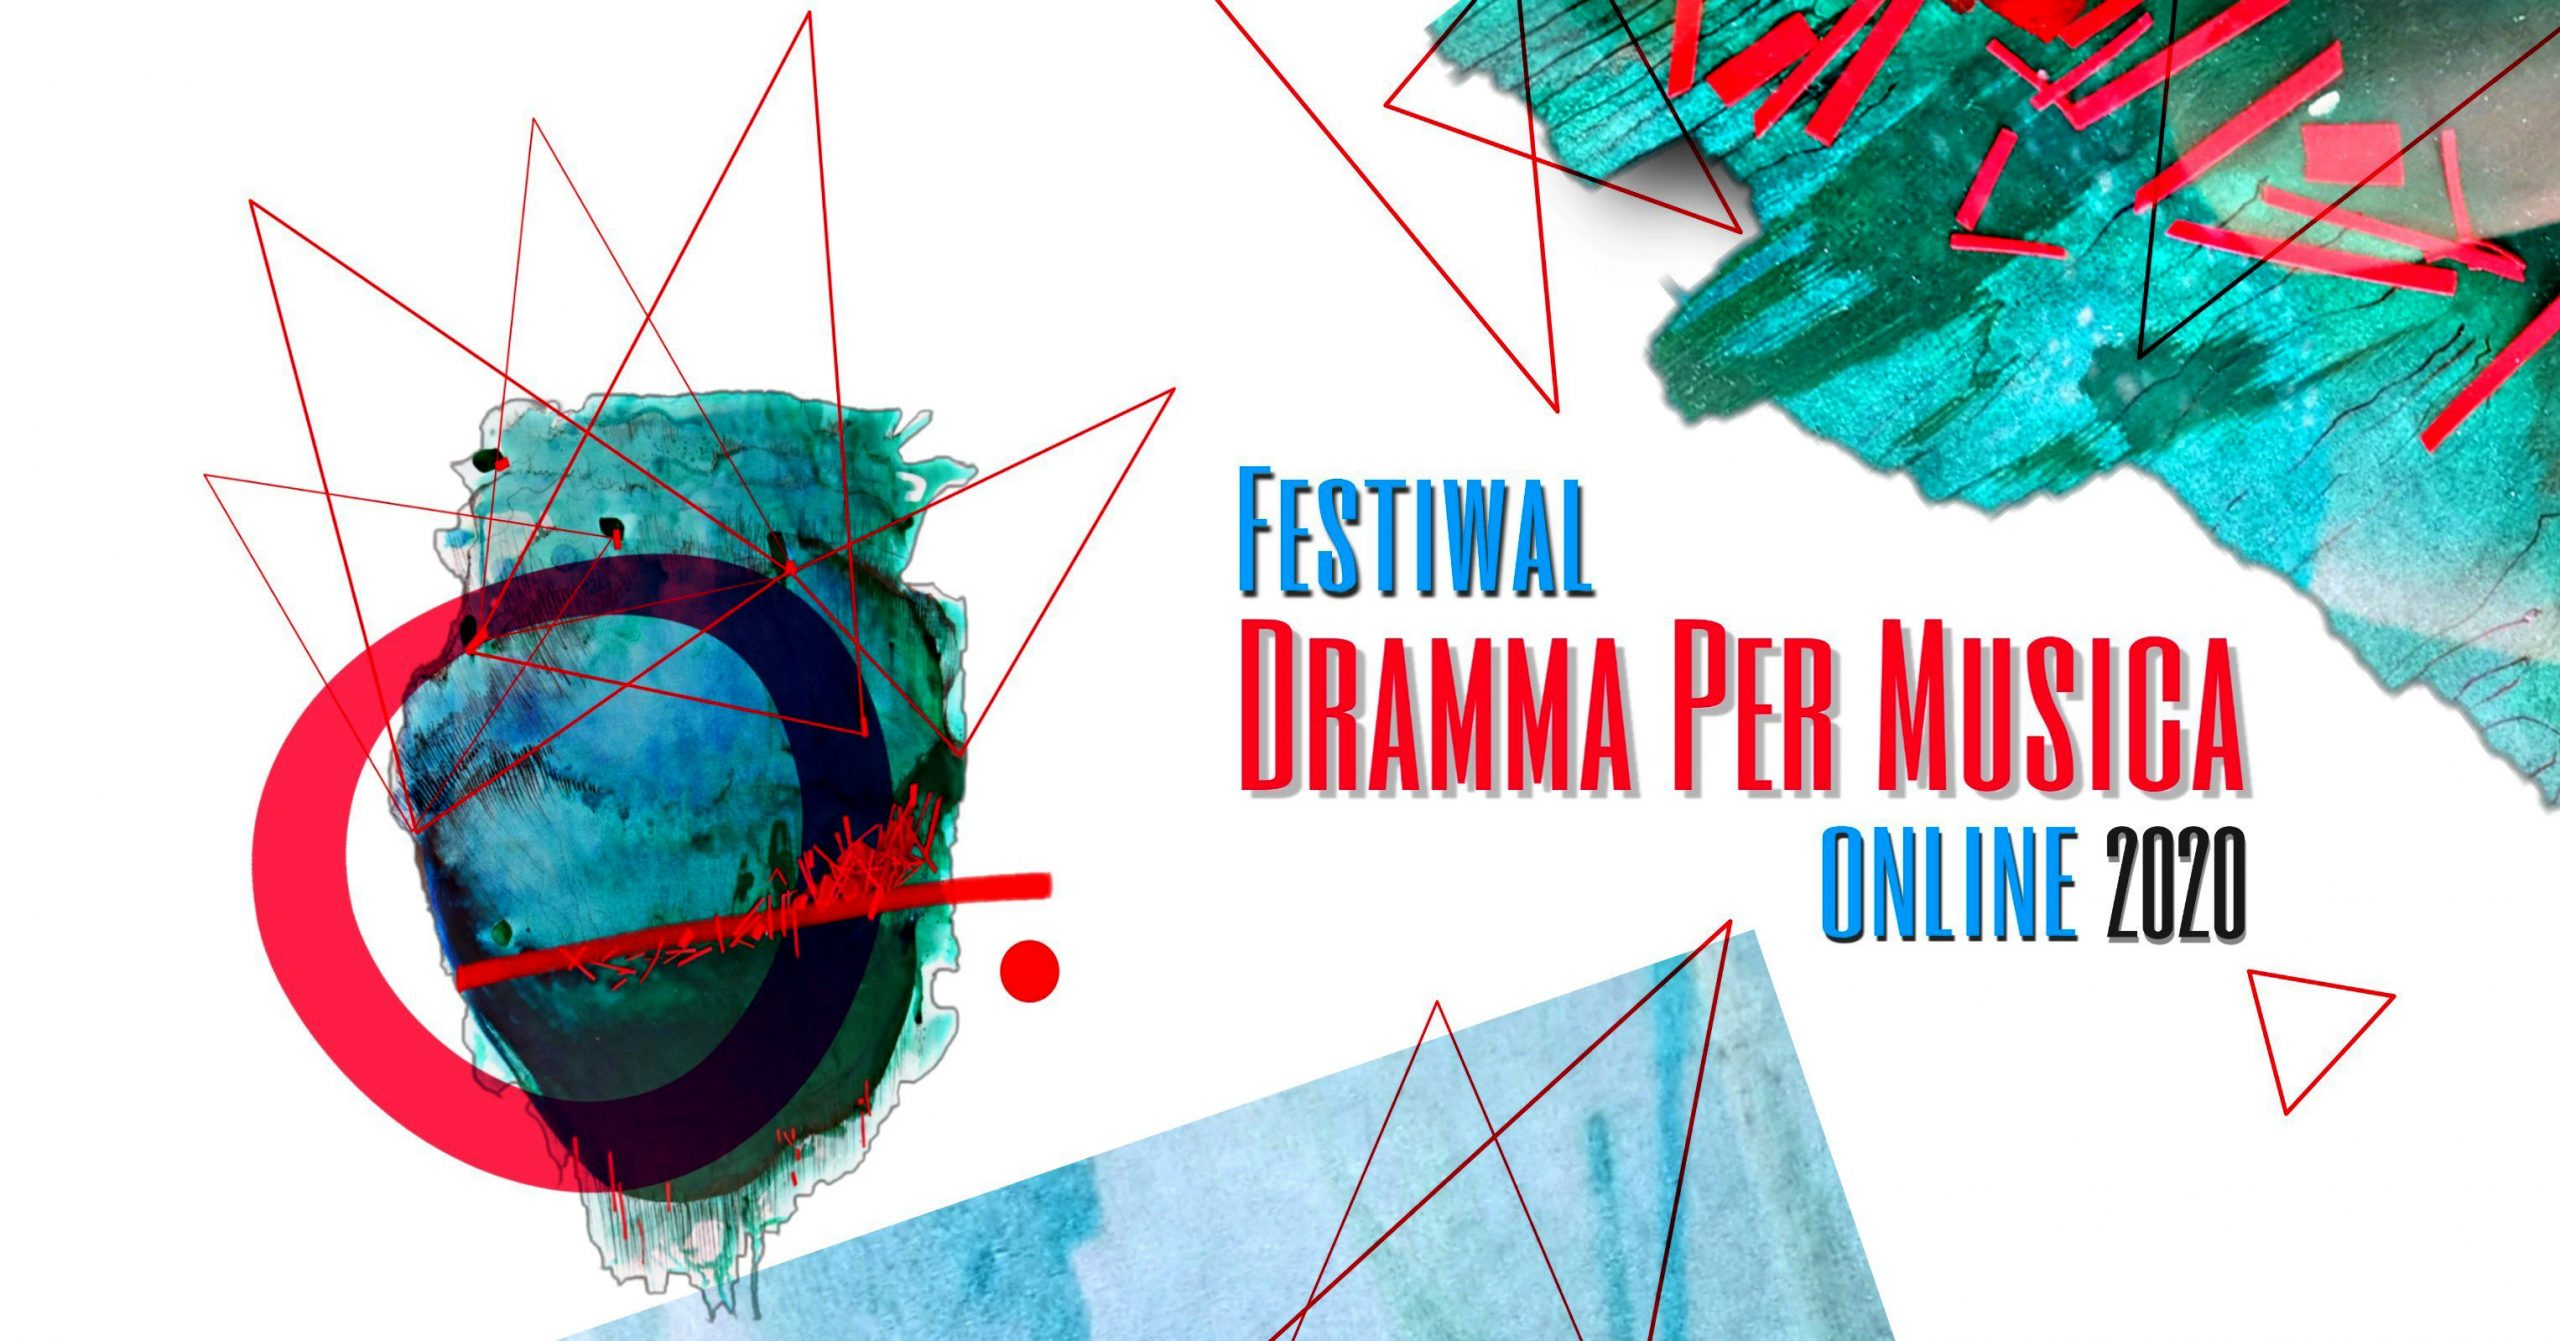 Festiwal Dramma per Musica 2020 ONLINE